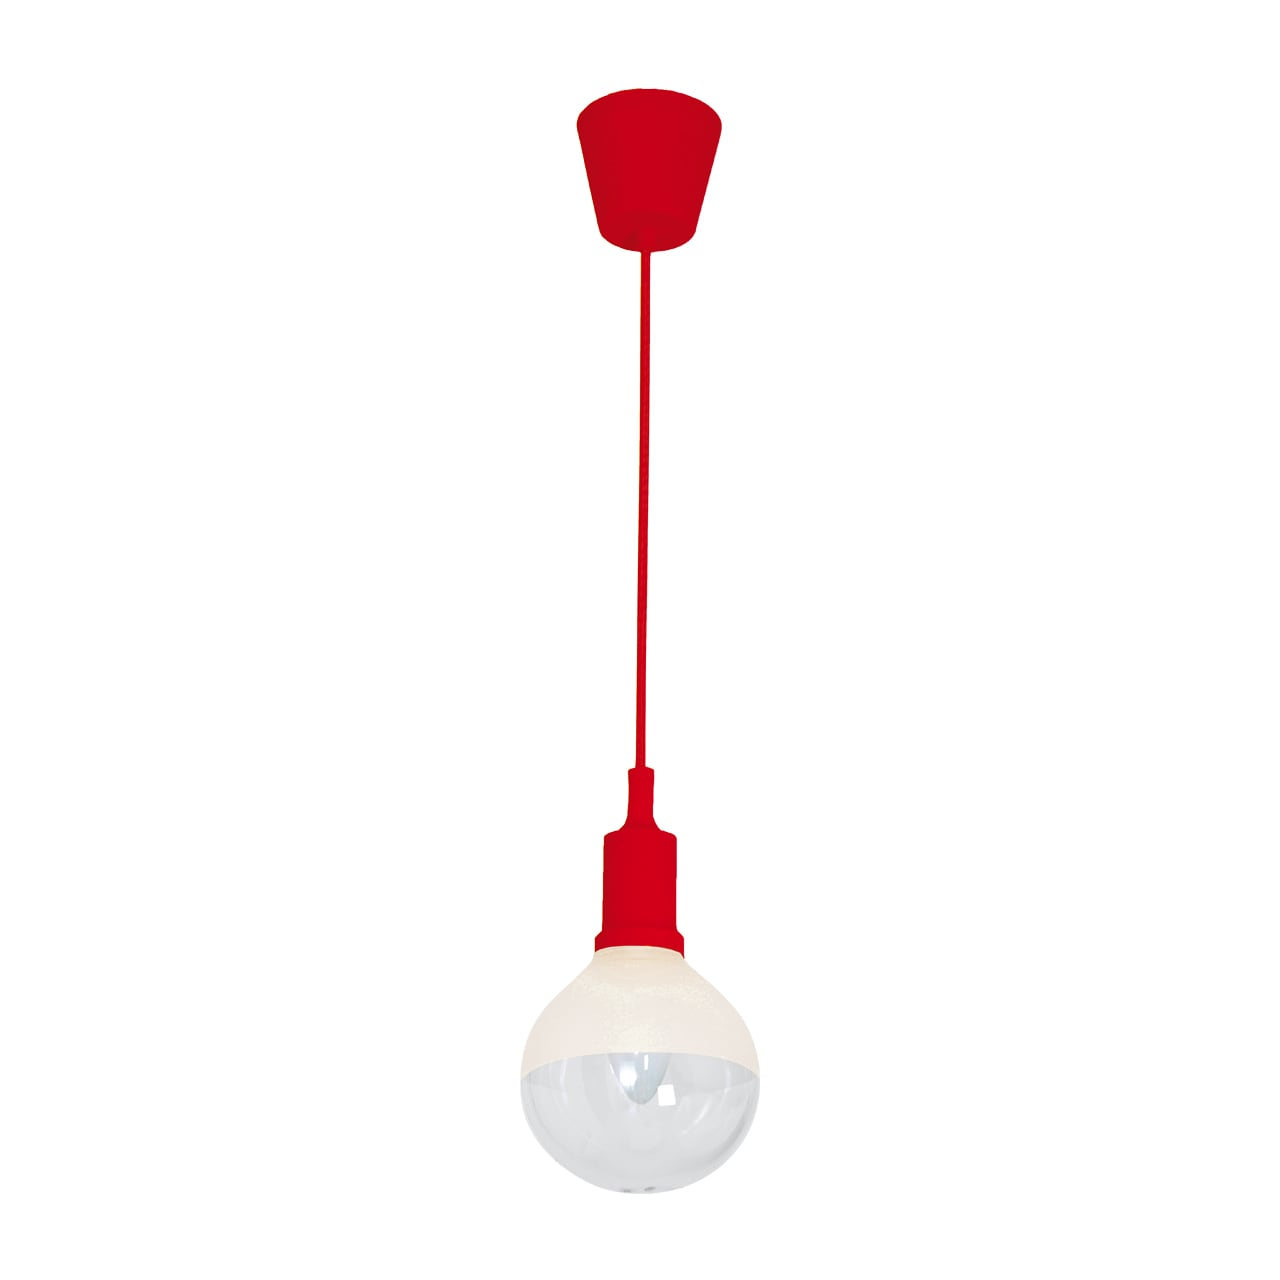 Hängelampe Milagro BUBBLE RED 462 Red 5W